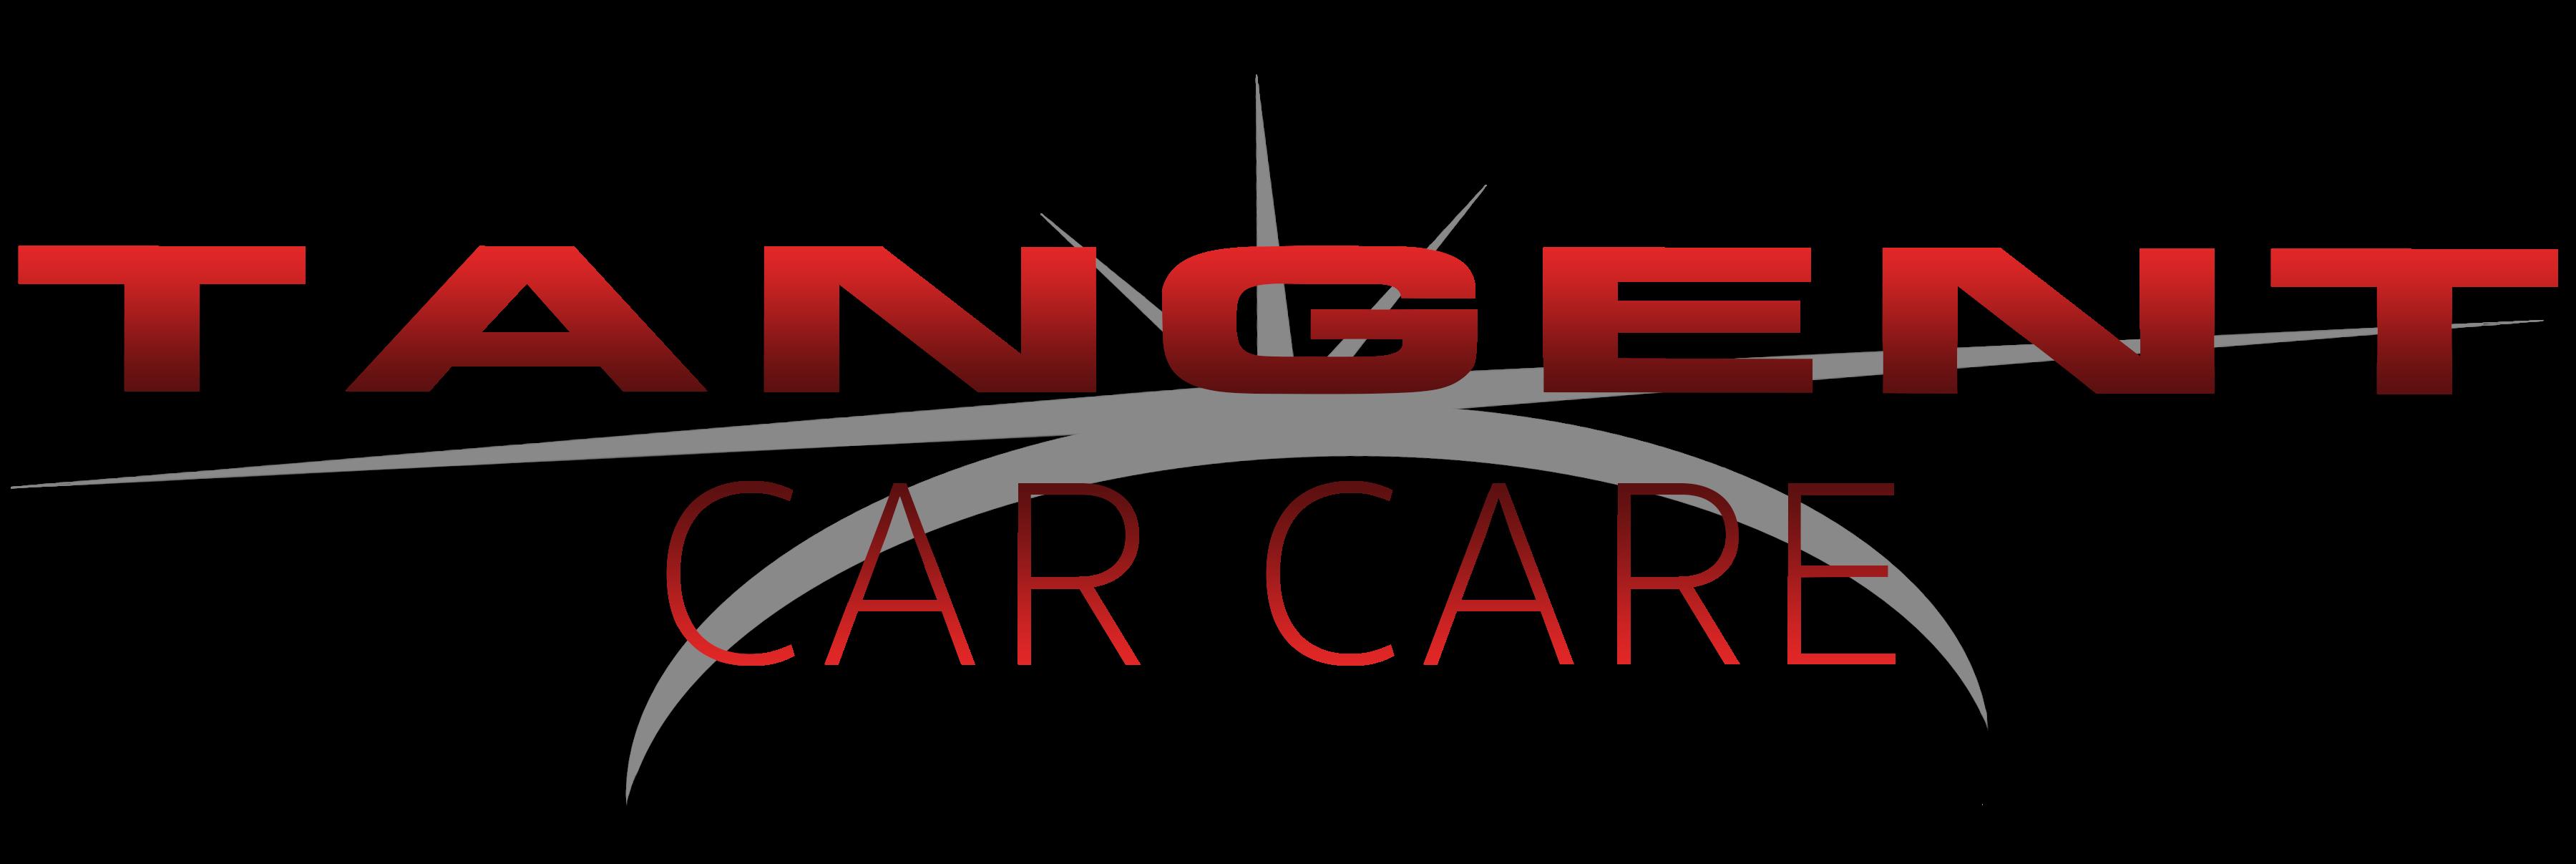 TANGENT CAR CARE